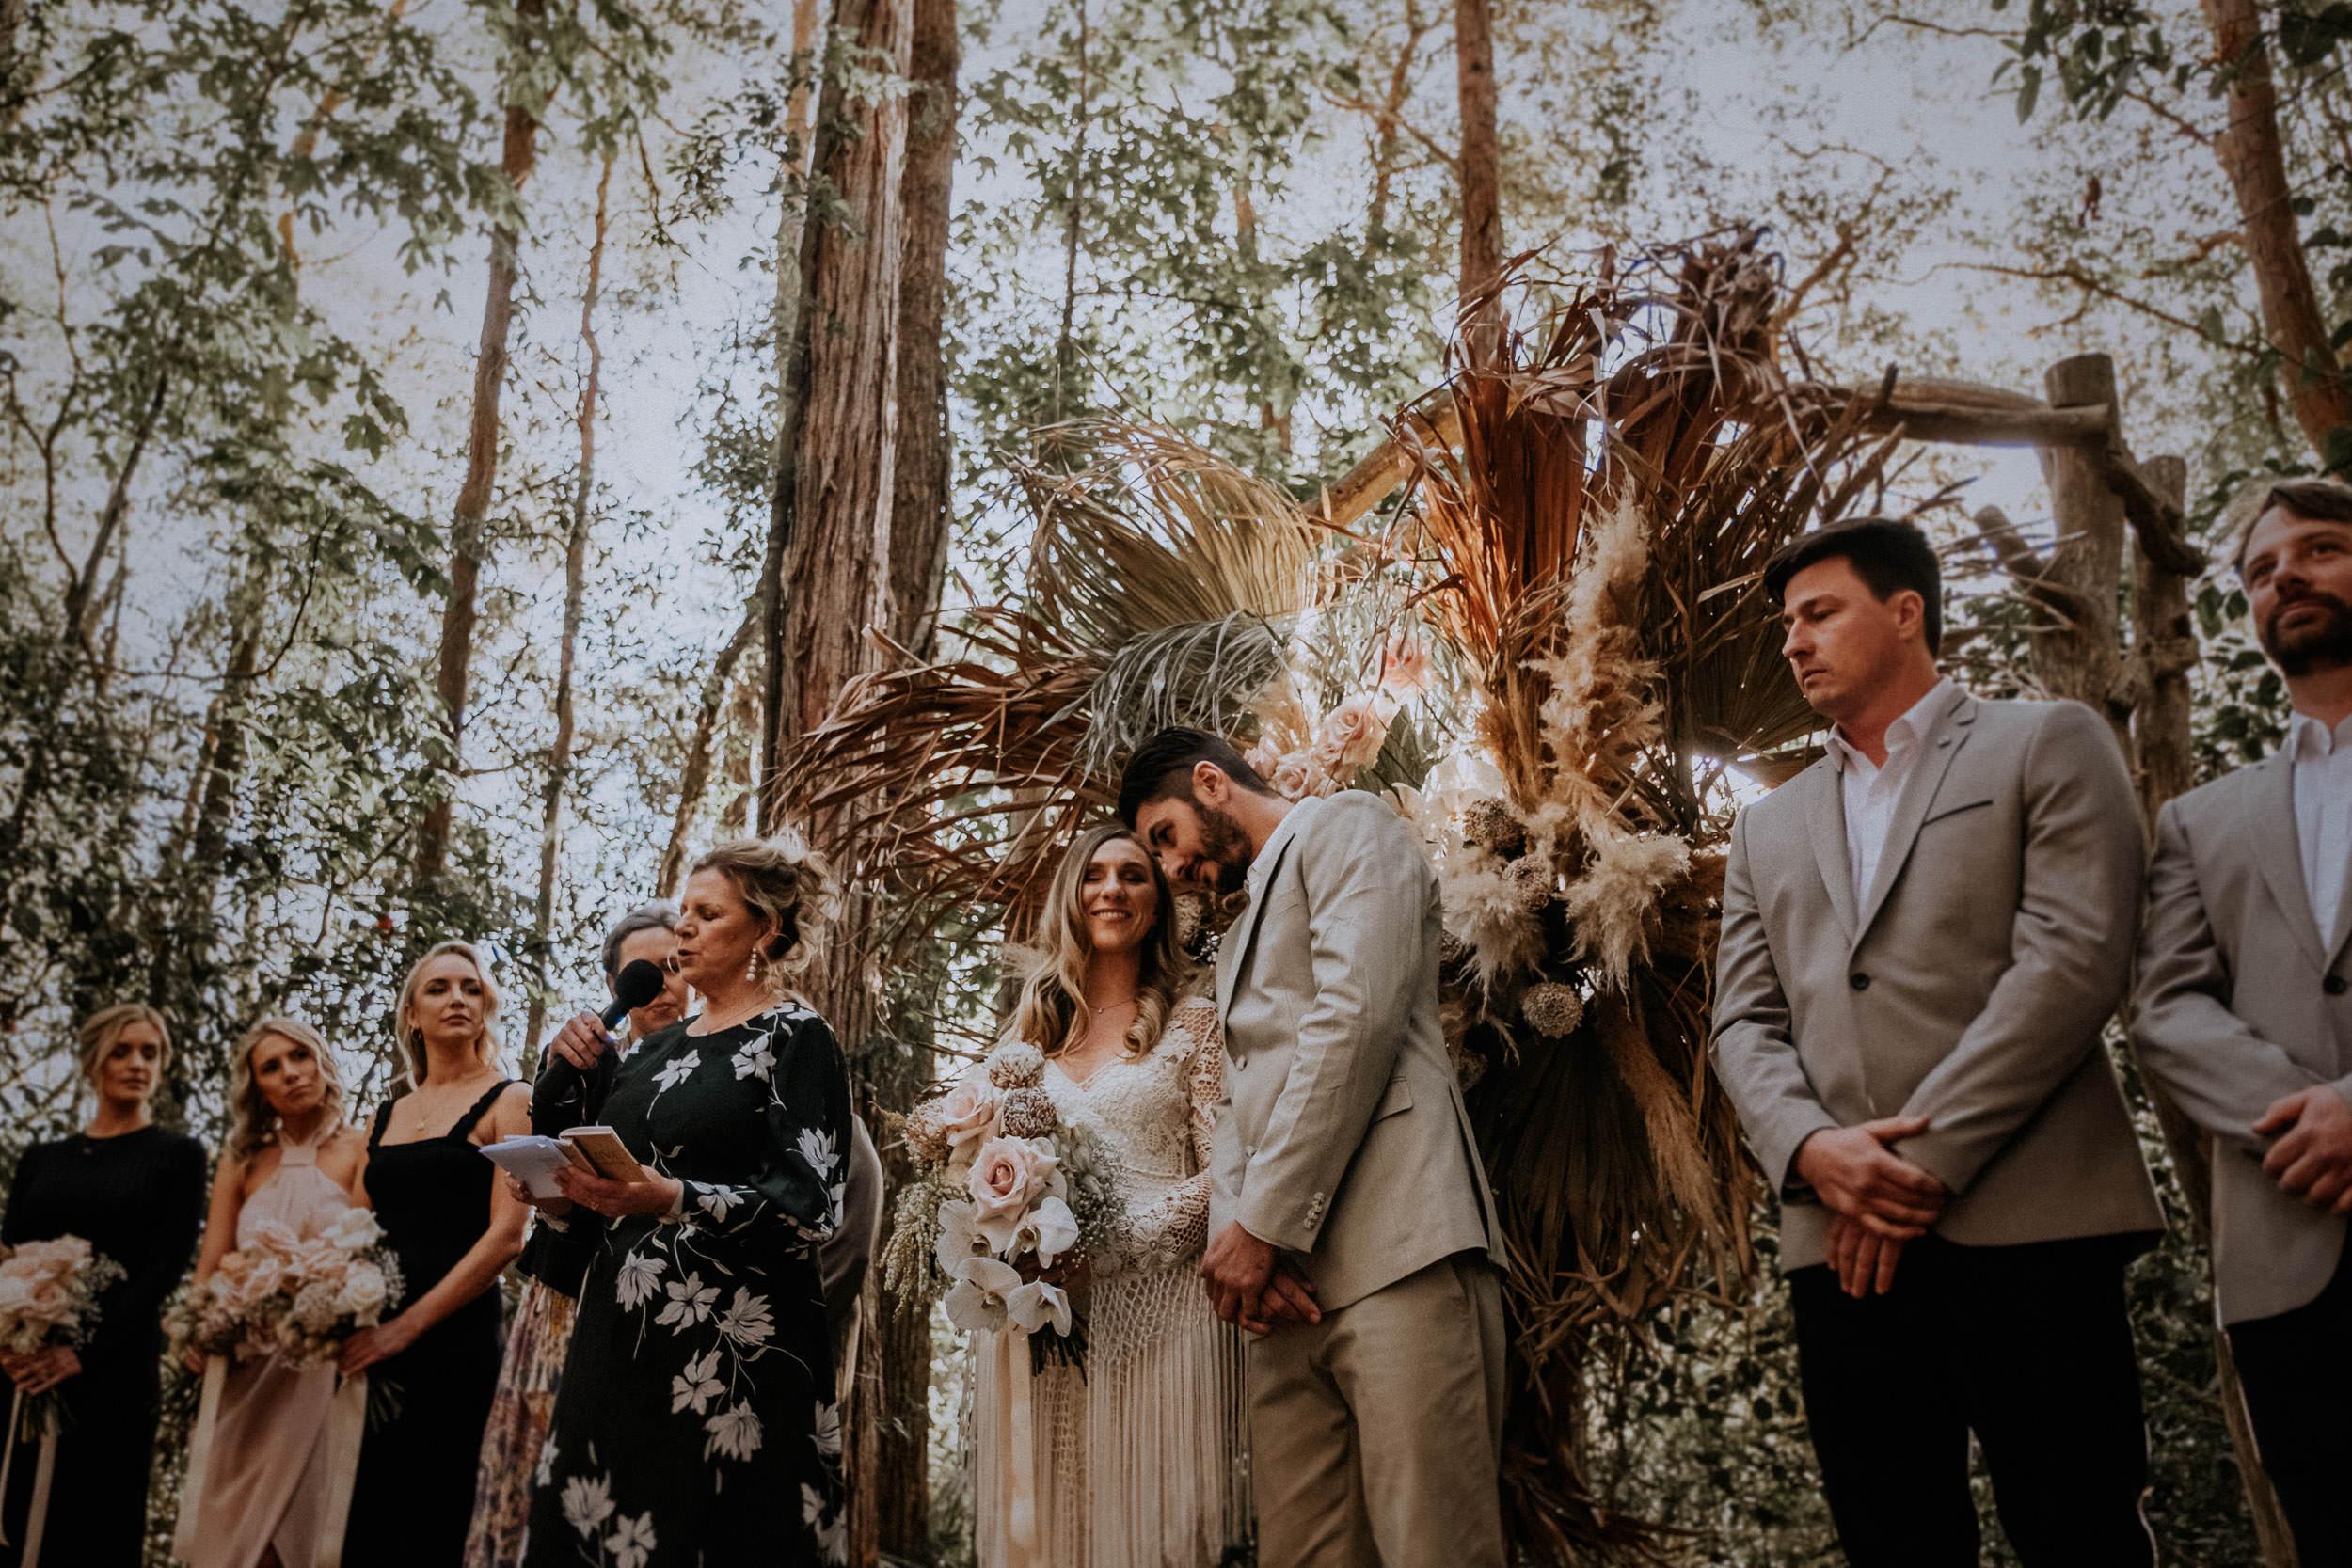 S&A Elopement - Kings & Thieves - Shred 'Til Dead - Central Coast Beach Forest Wedding - 203.jpg